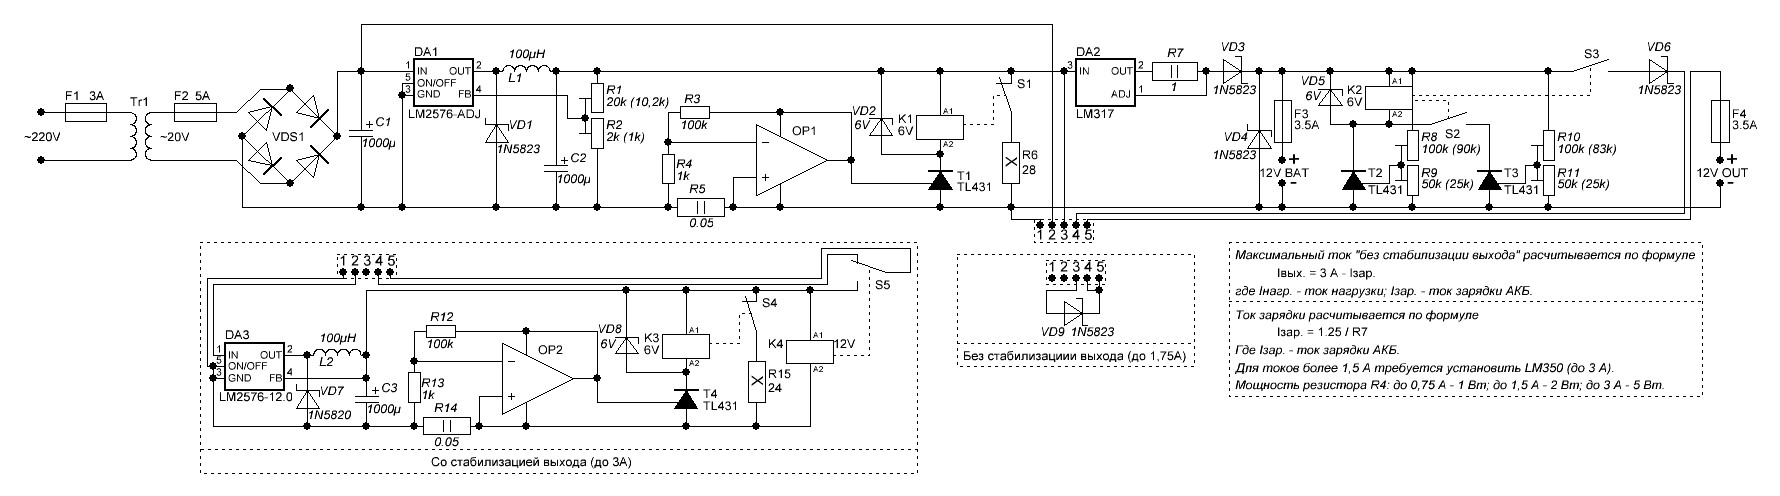 Схема зарядка для аккумулятора 12v 7ah схема